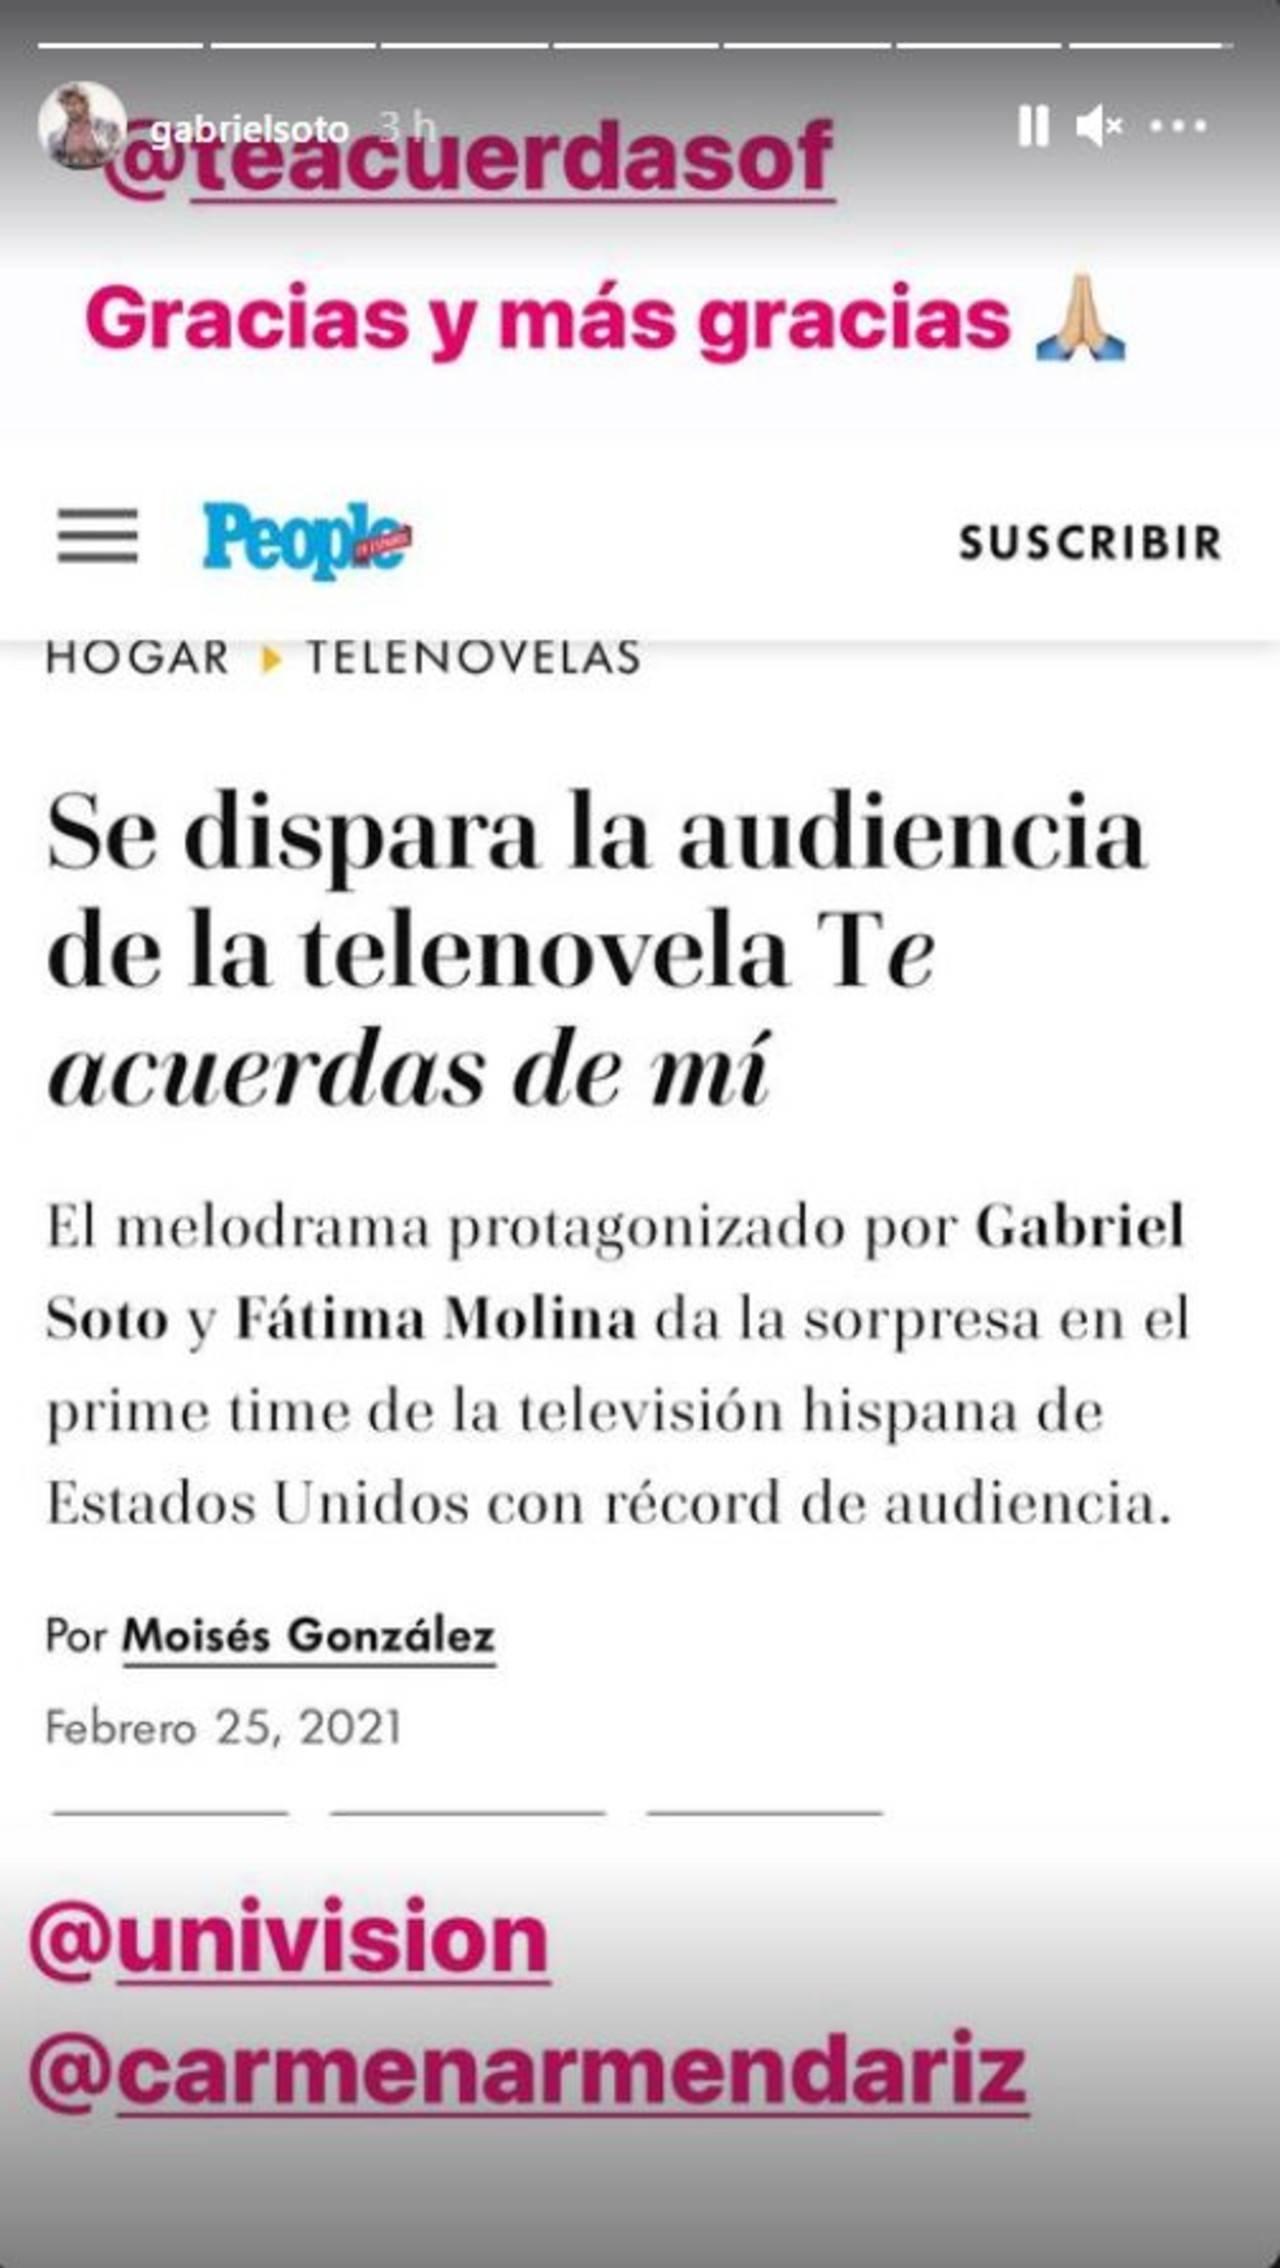 gabriel soto fatima molina rating telenovela